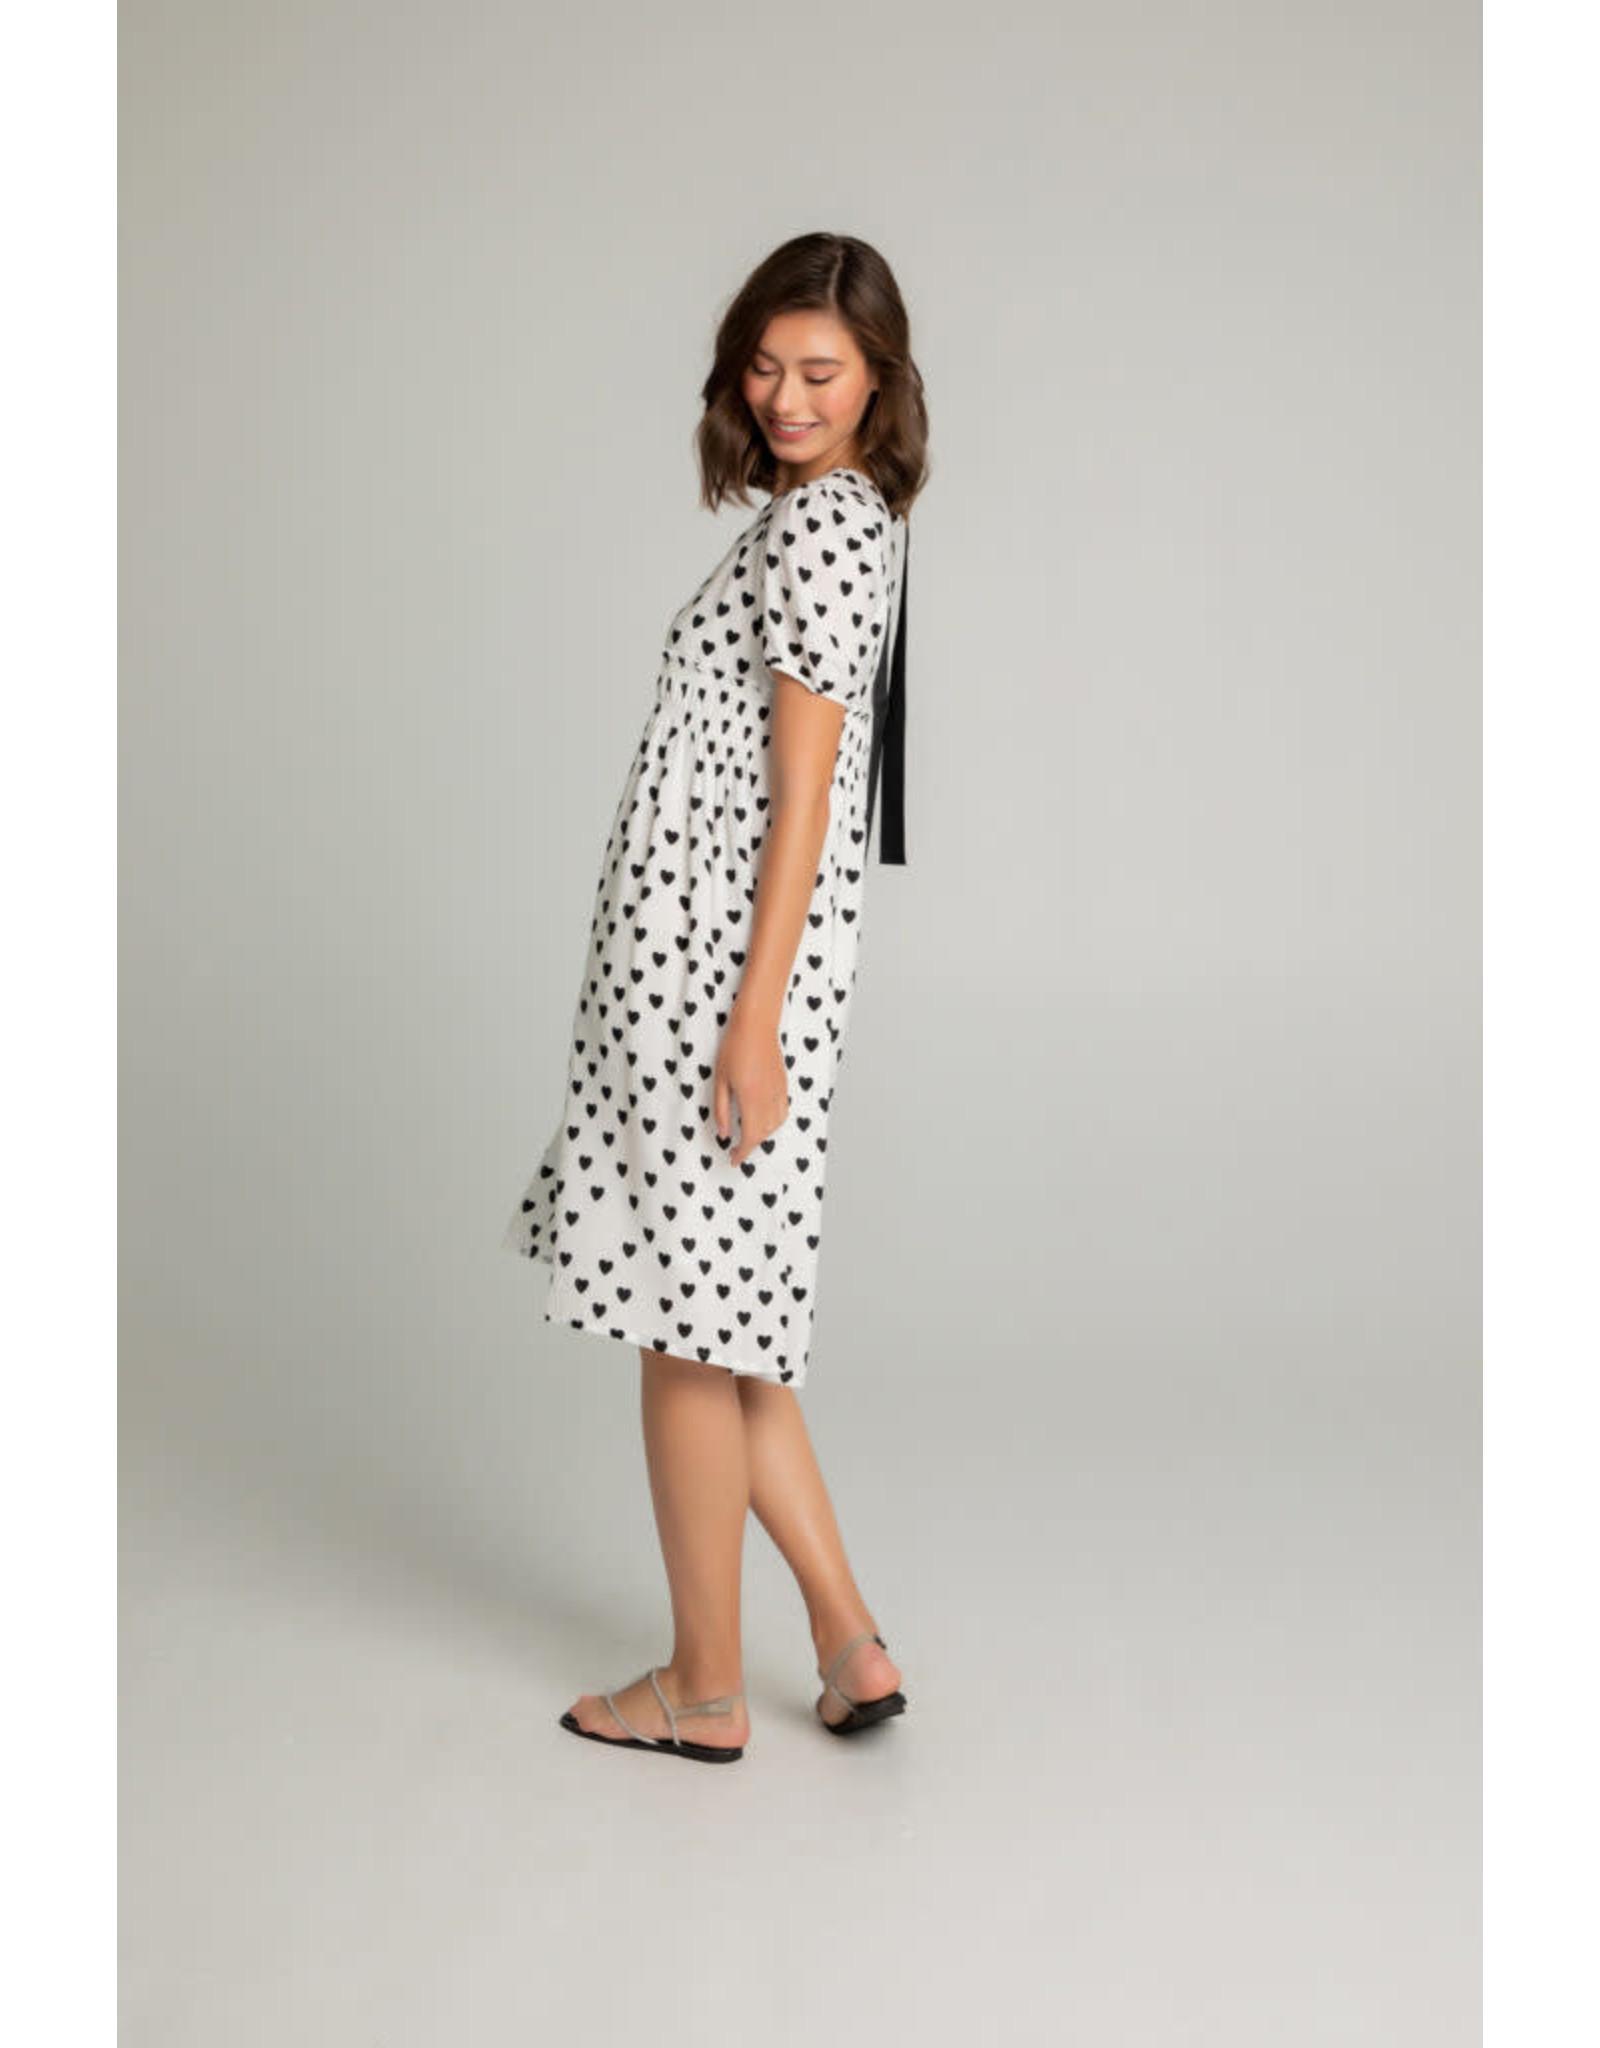 GABBY ISABELLA 321610 DRESS